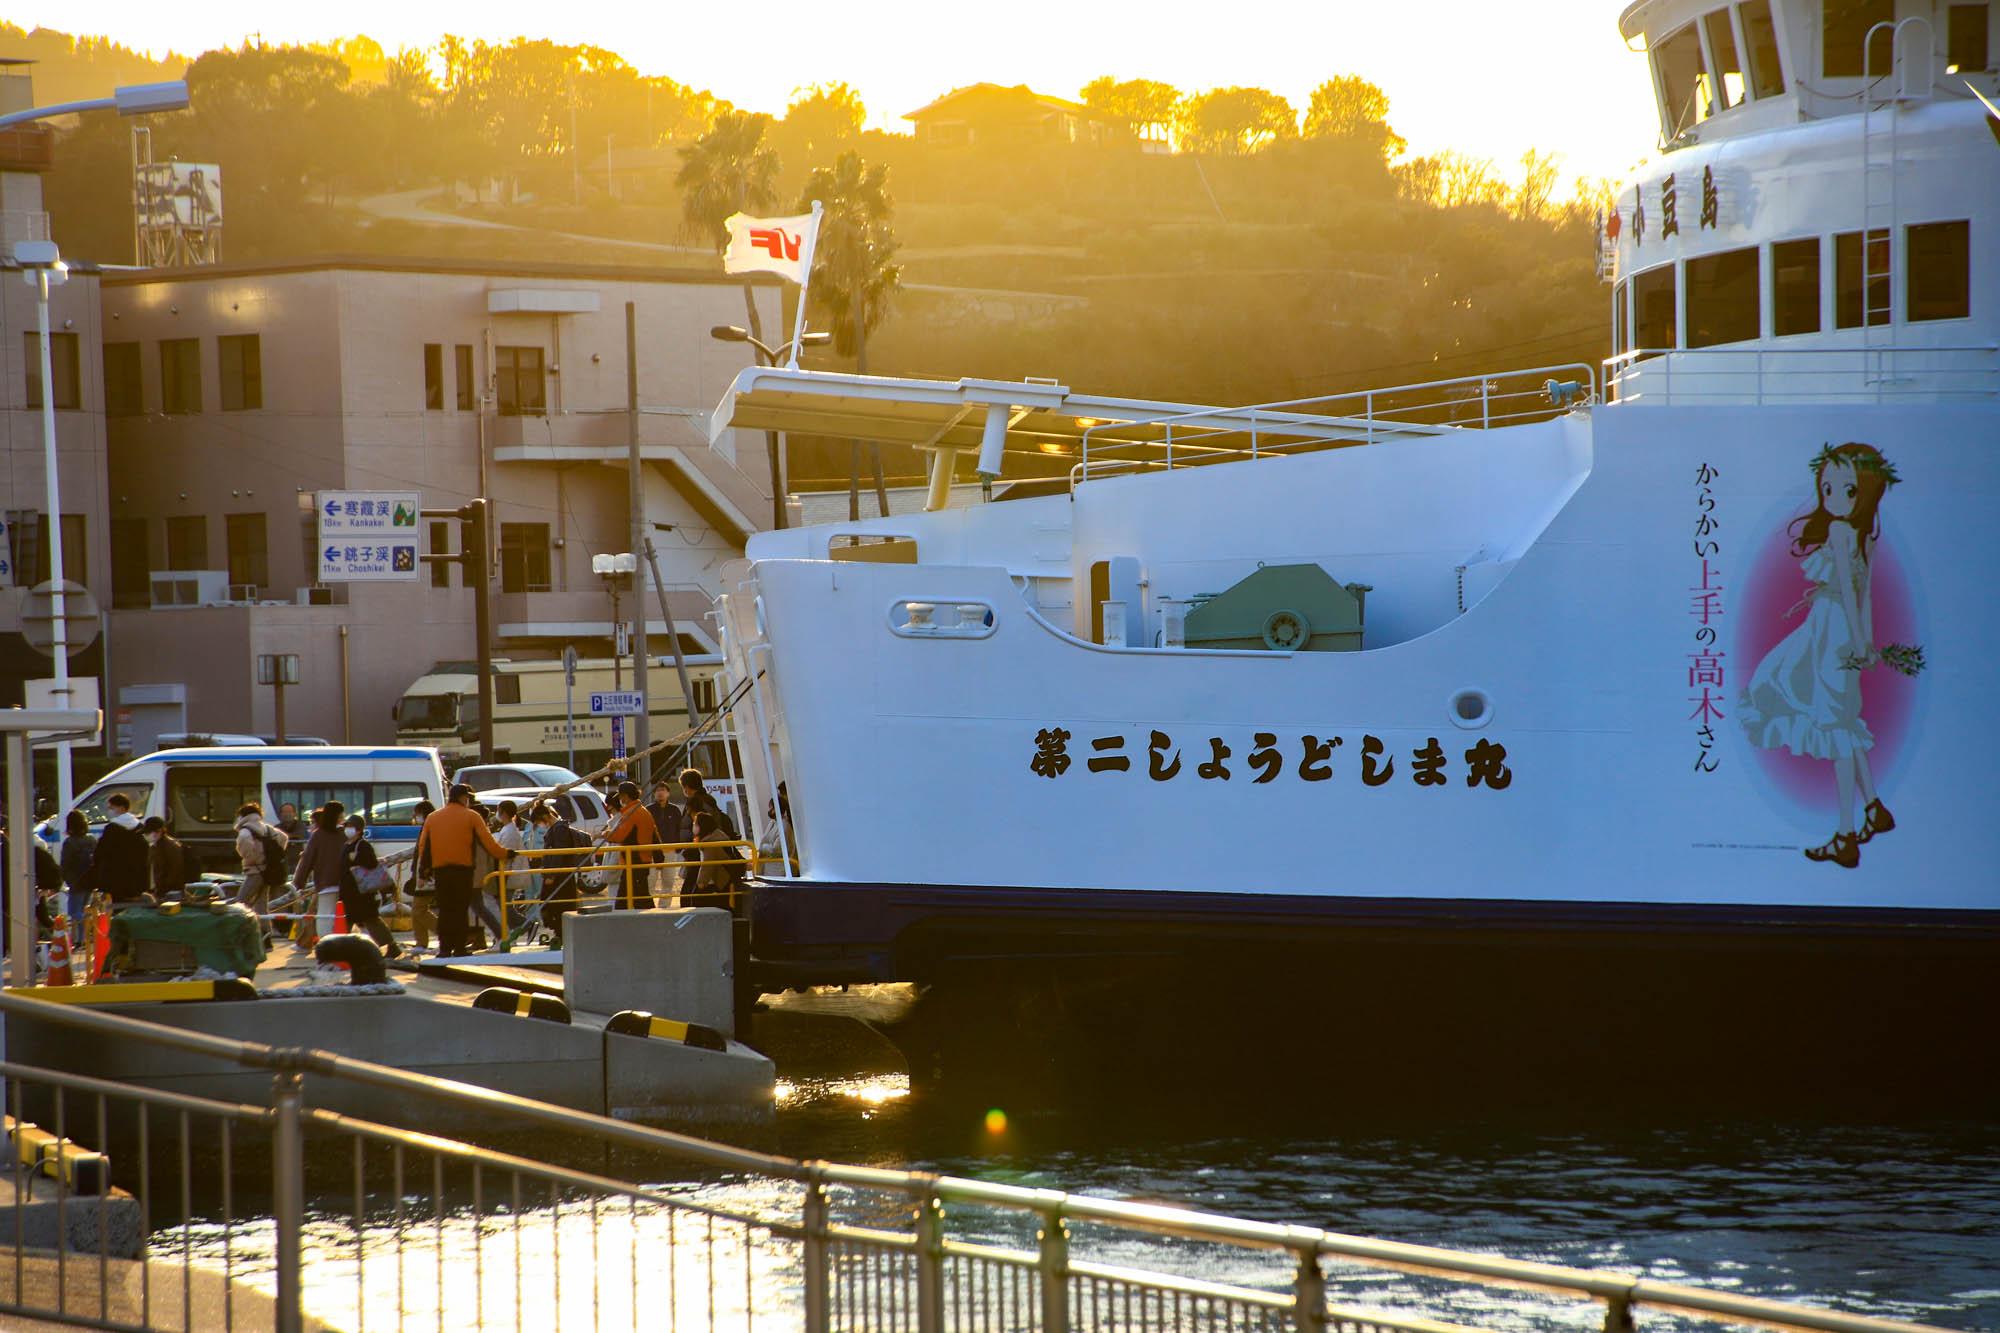 takagisan_ferry-9.jpg